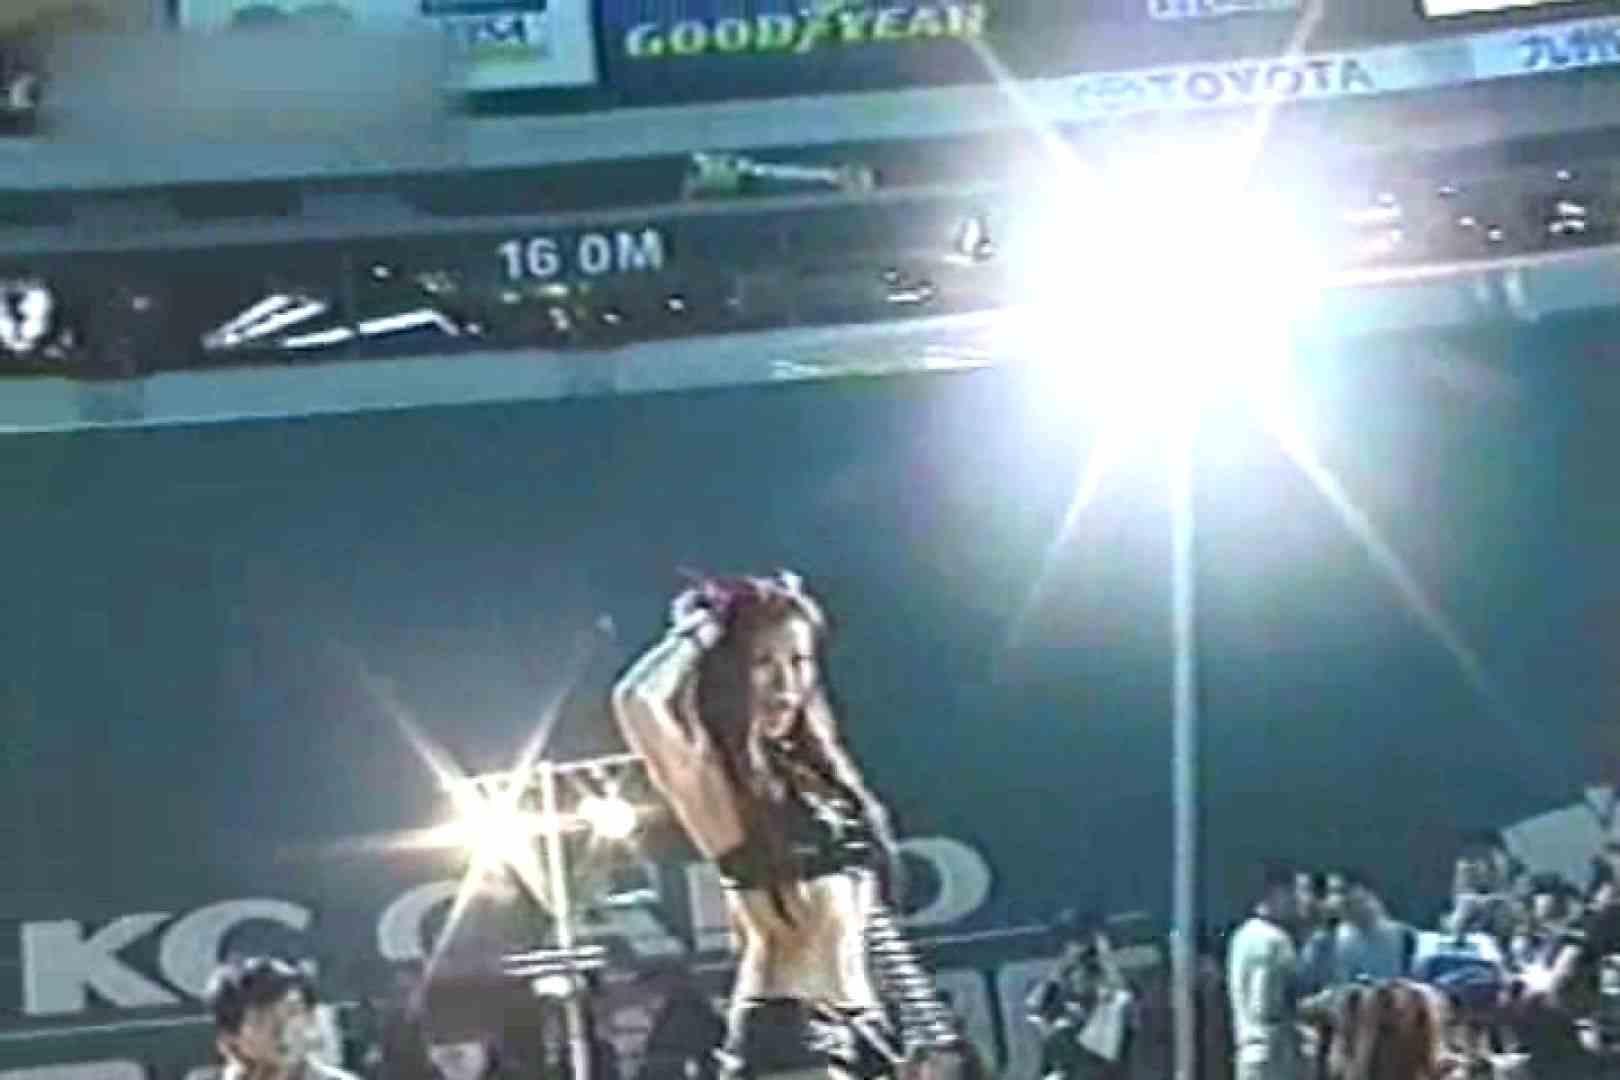 RQカメラ地獄Vol.24 お姉さんのエッチ | OLヌード天国  74PIX 51